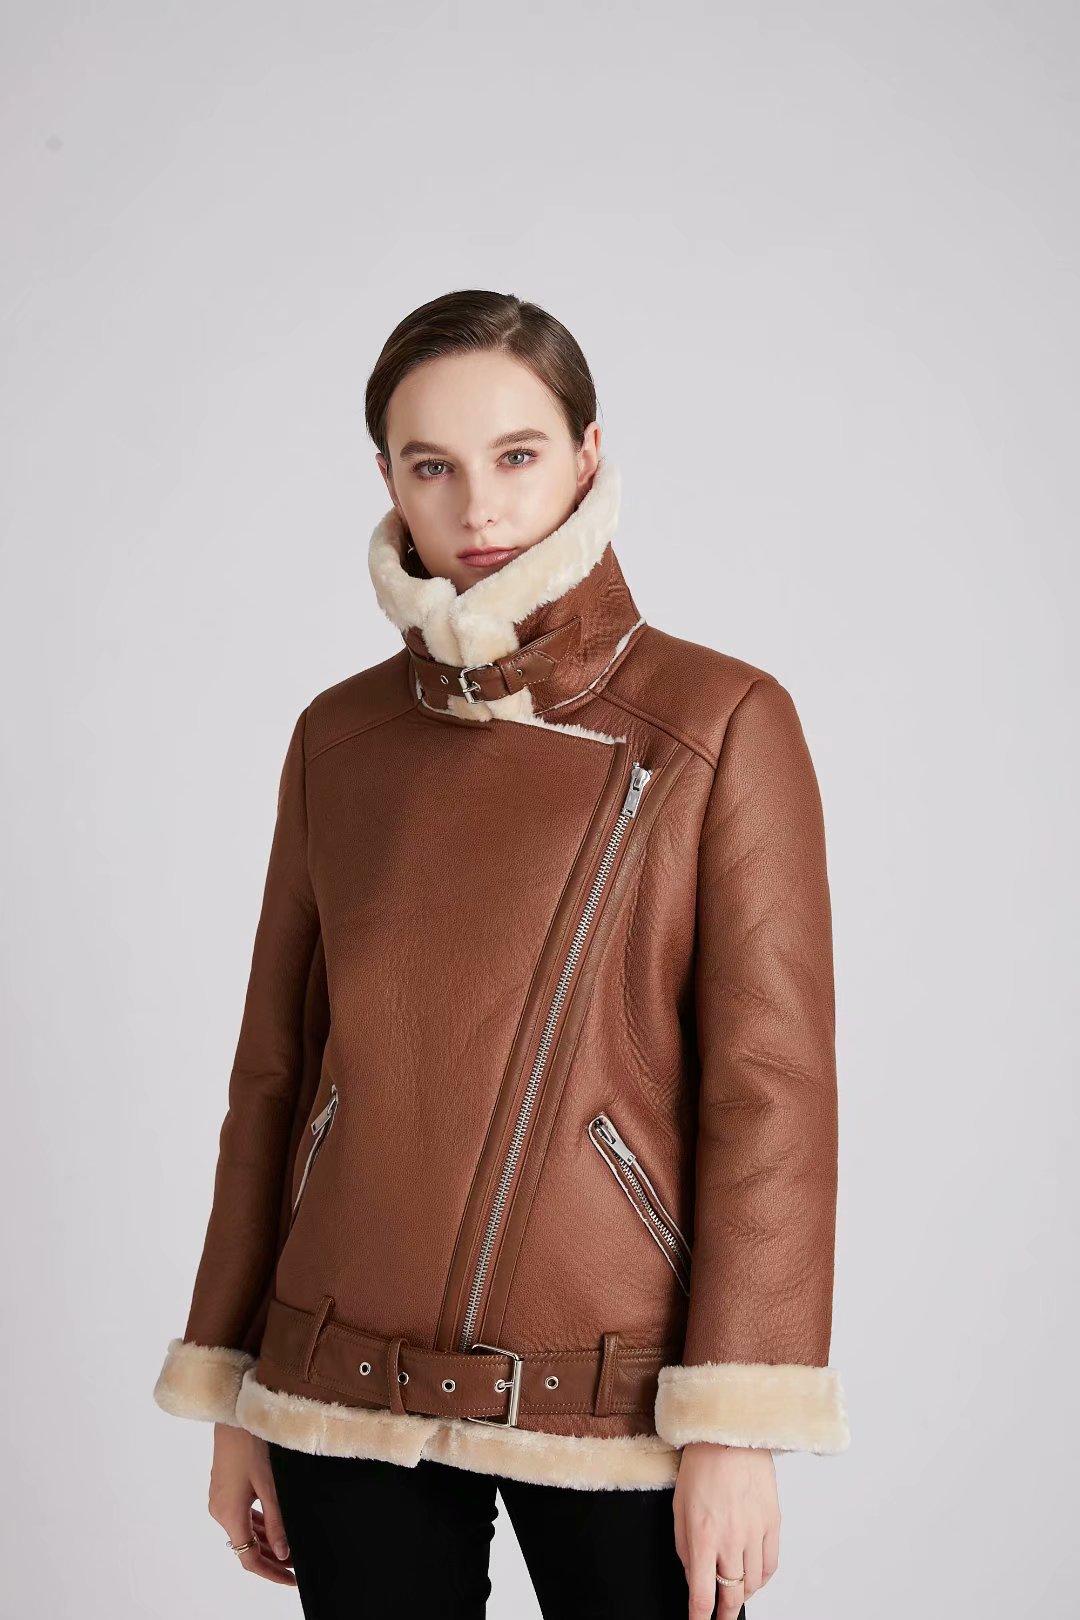 дубленкаженская 2020 Autumn And Winter Thick Faux Fur Mid-Length Motorcycle Jacket Women Jacket женскаякуртка enlarge